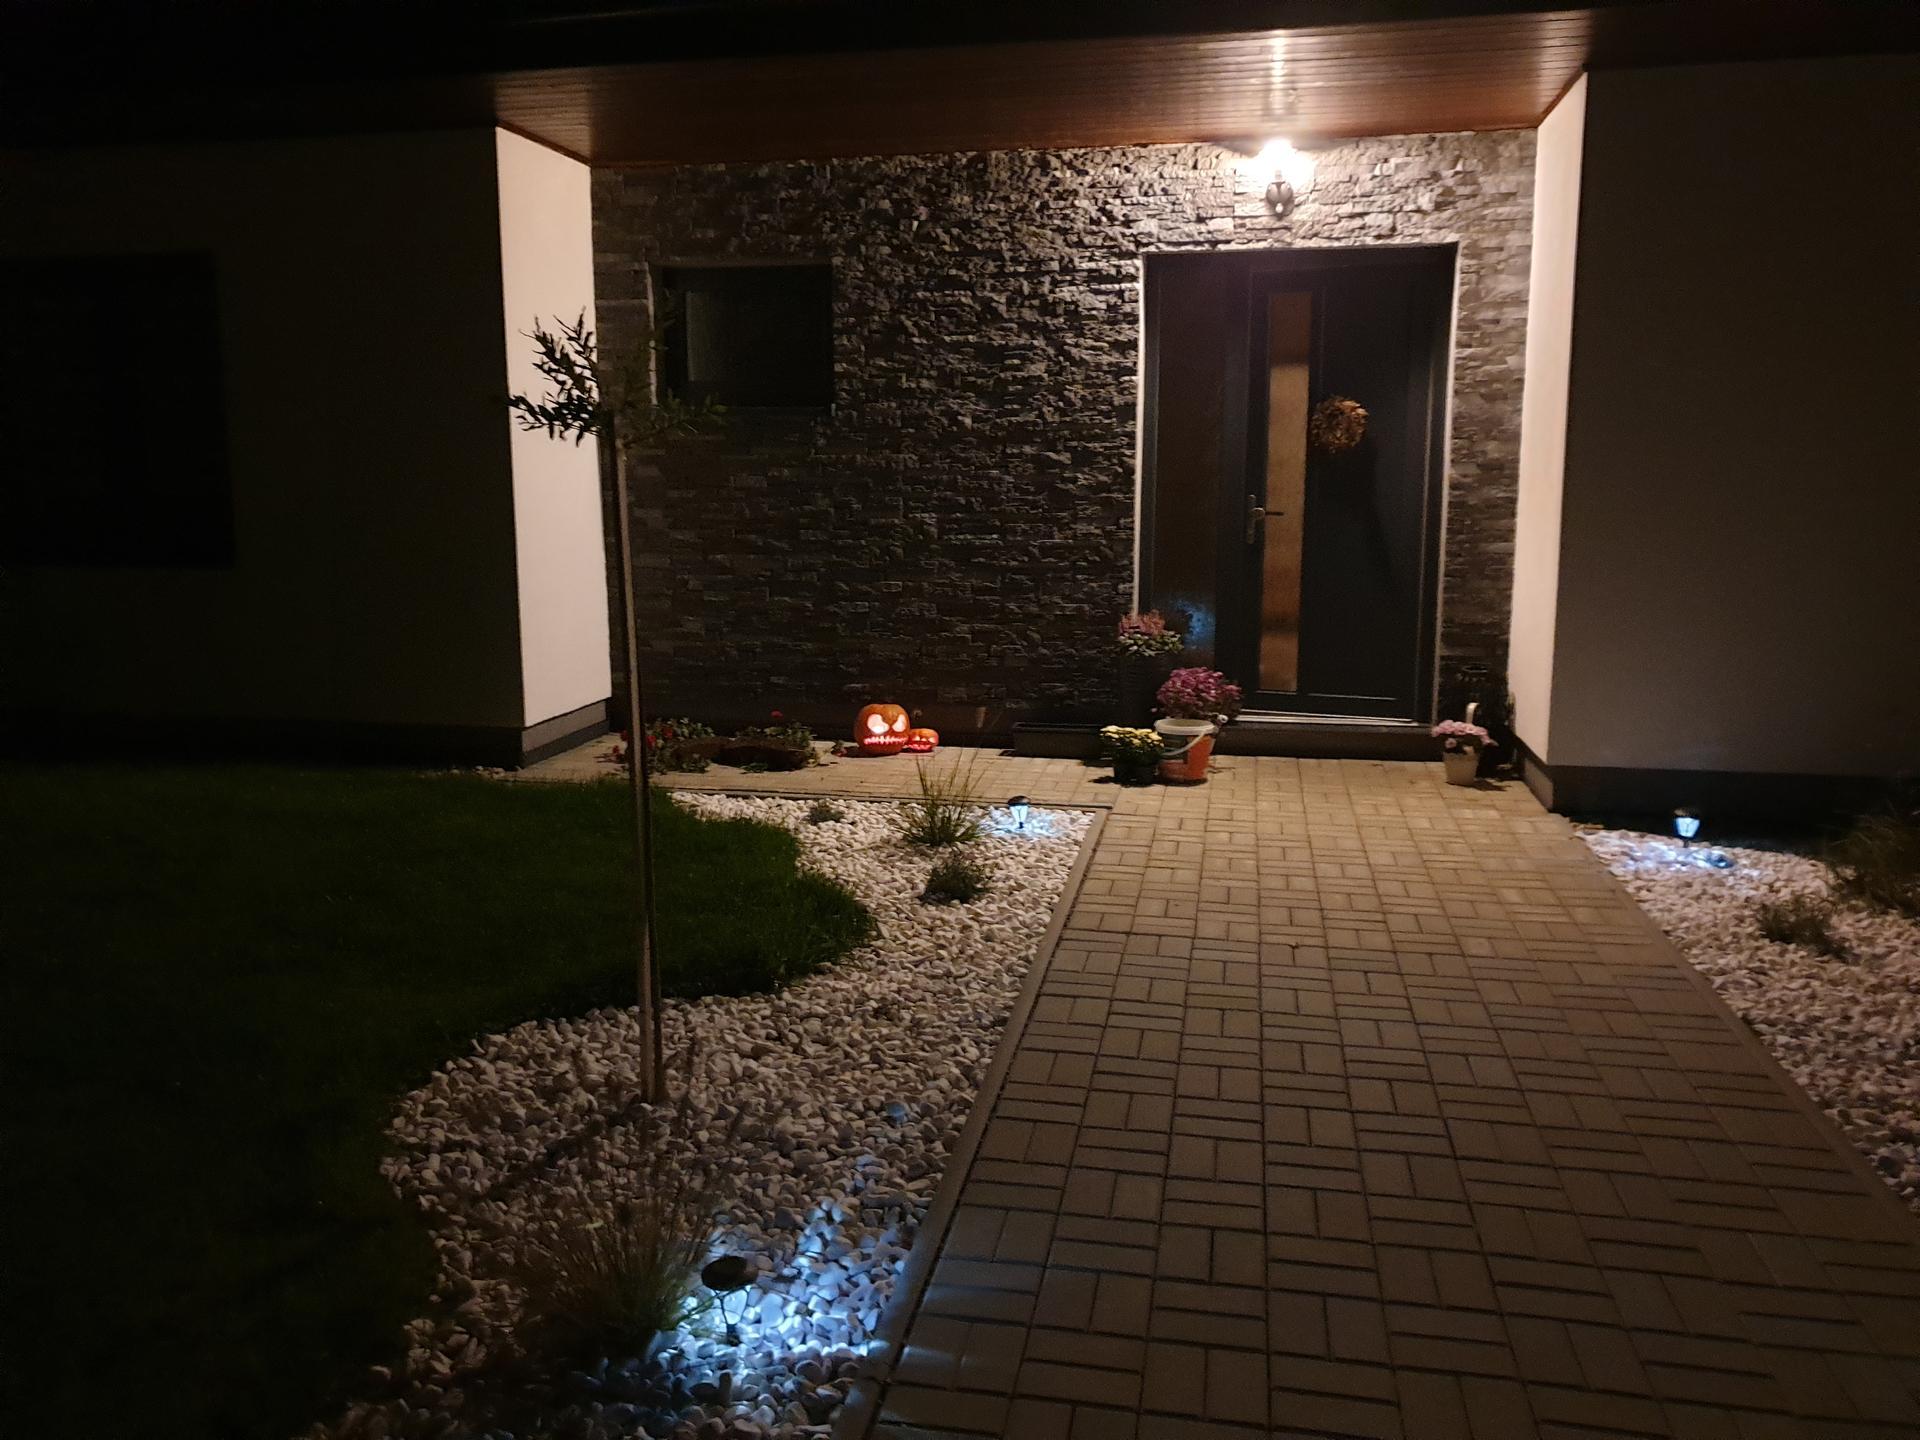 Zahrada a terasa - Obrázek č. 106